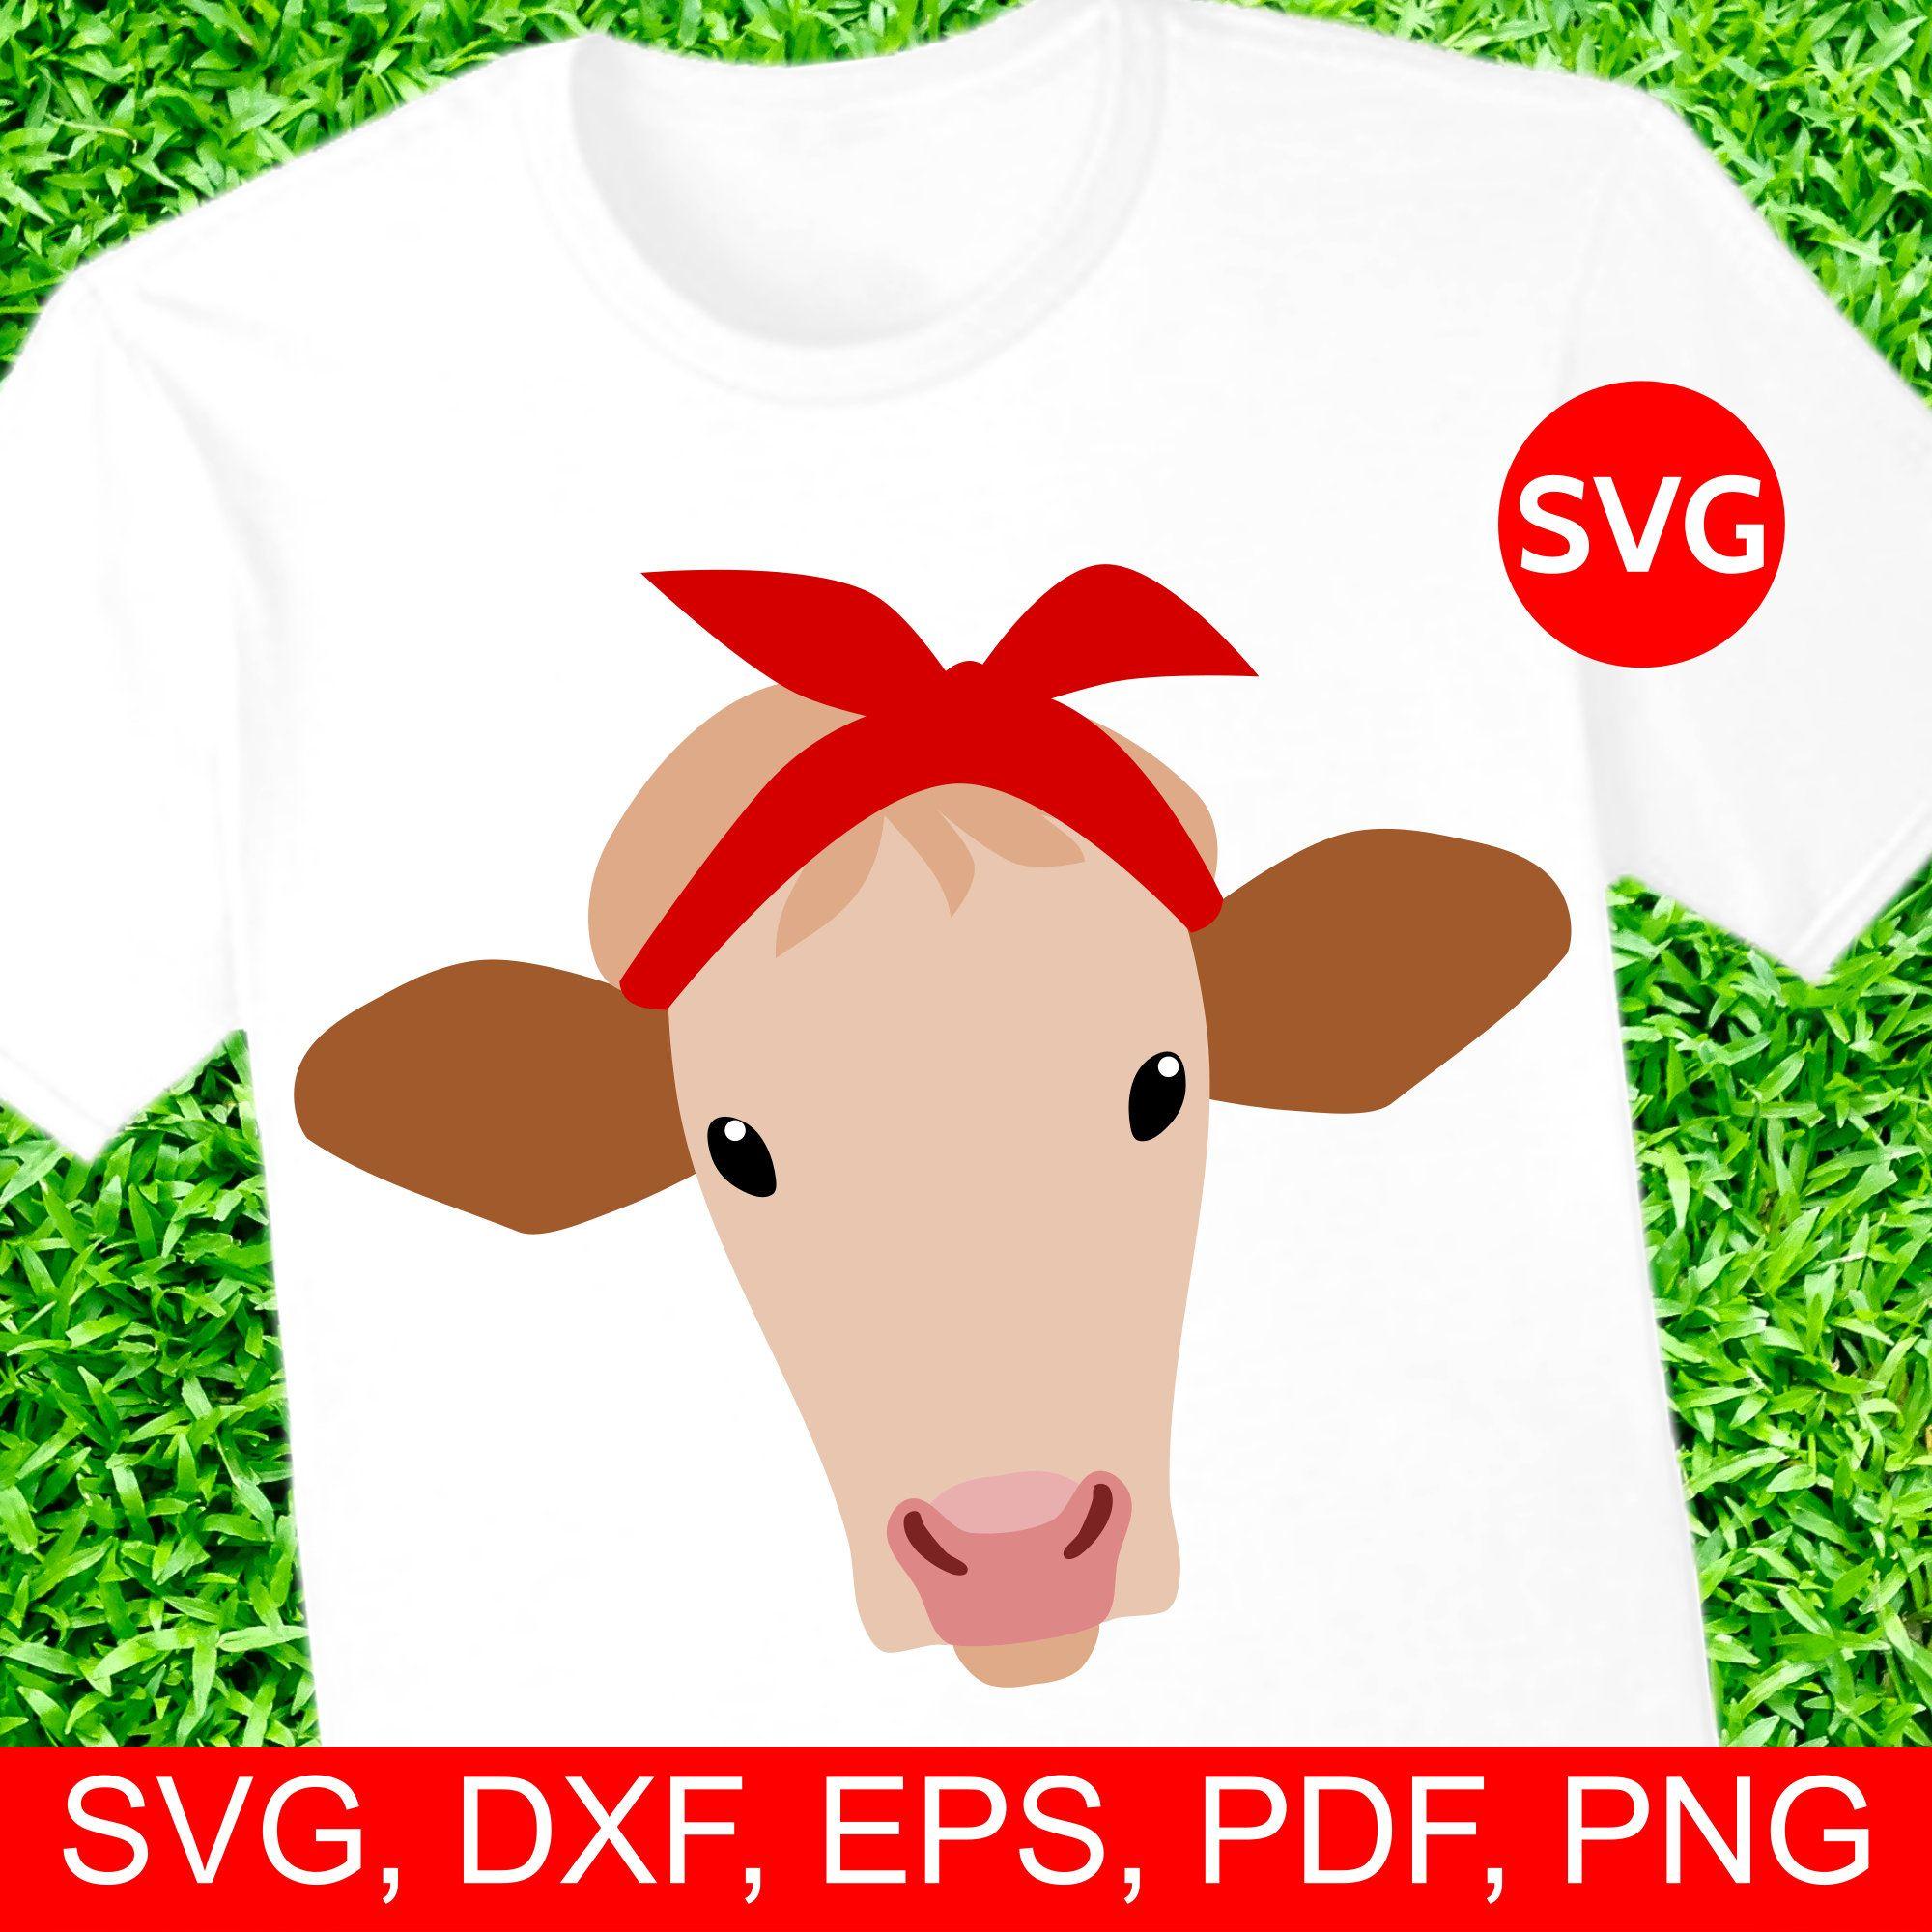 Bandana clipart printable. Heifer cow with svg